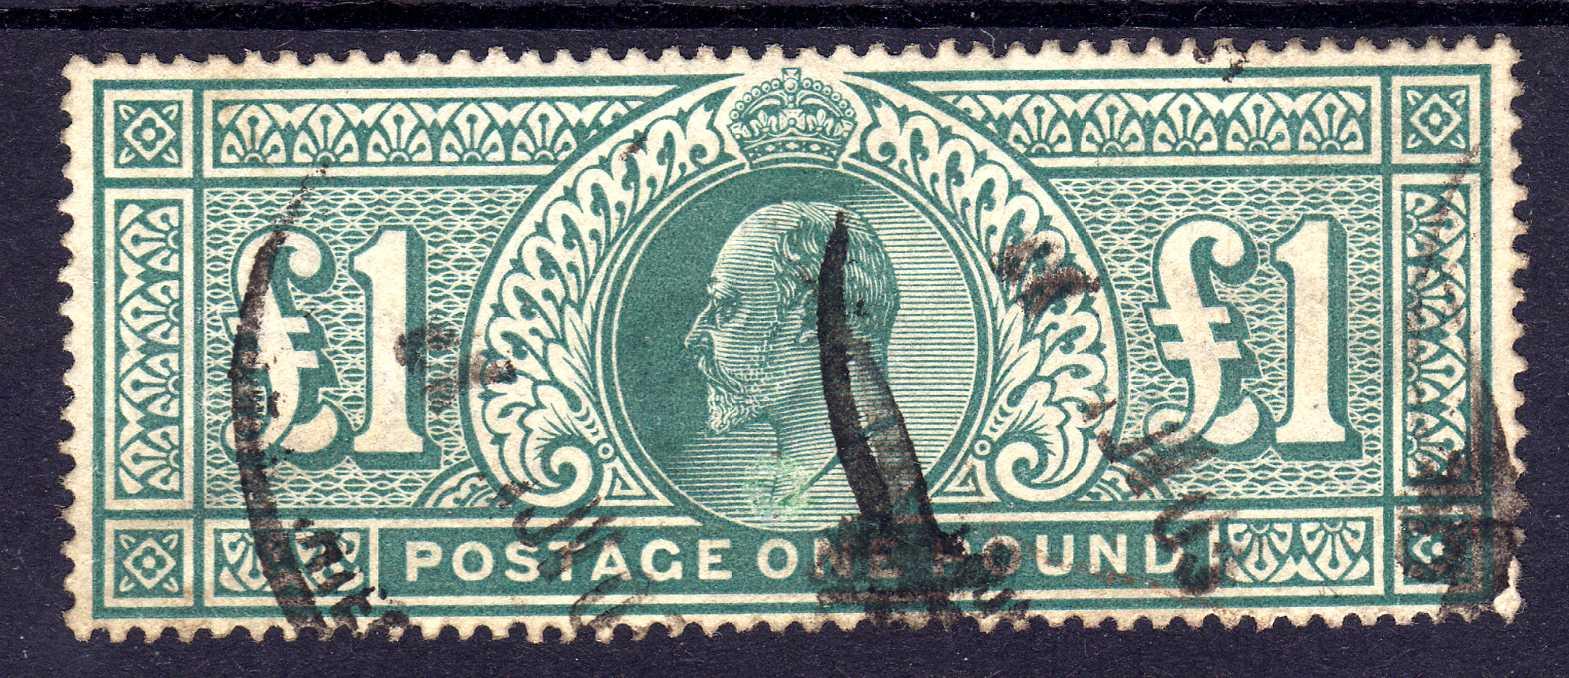 GB: 1902-10 £1 GREEN GOOD USED, SG 266